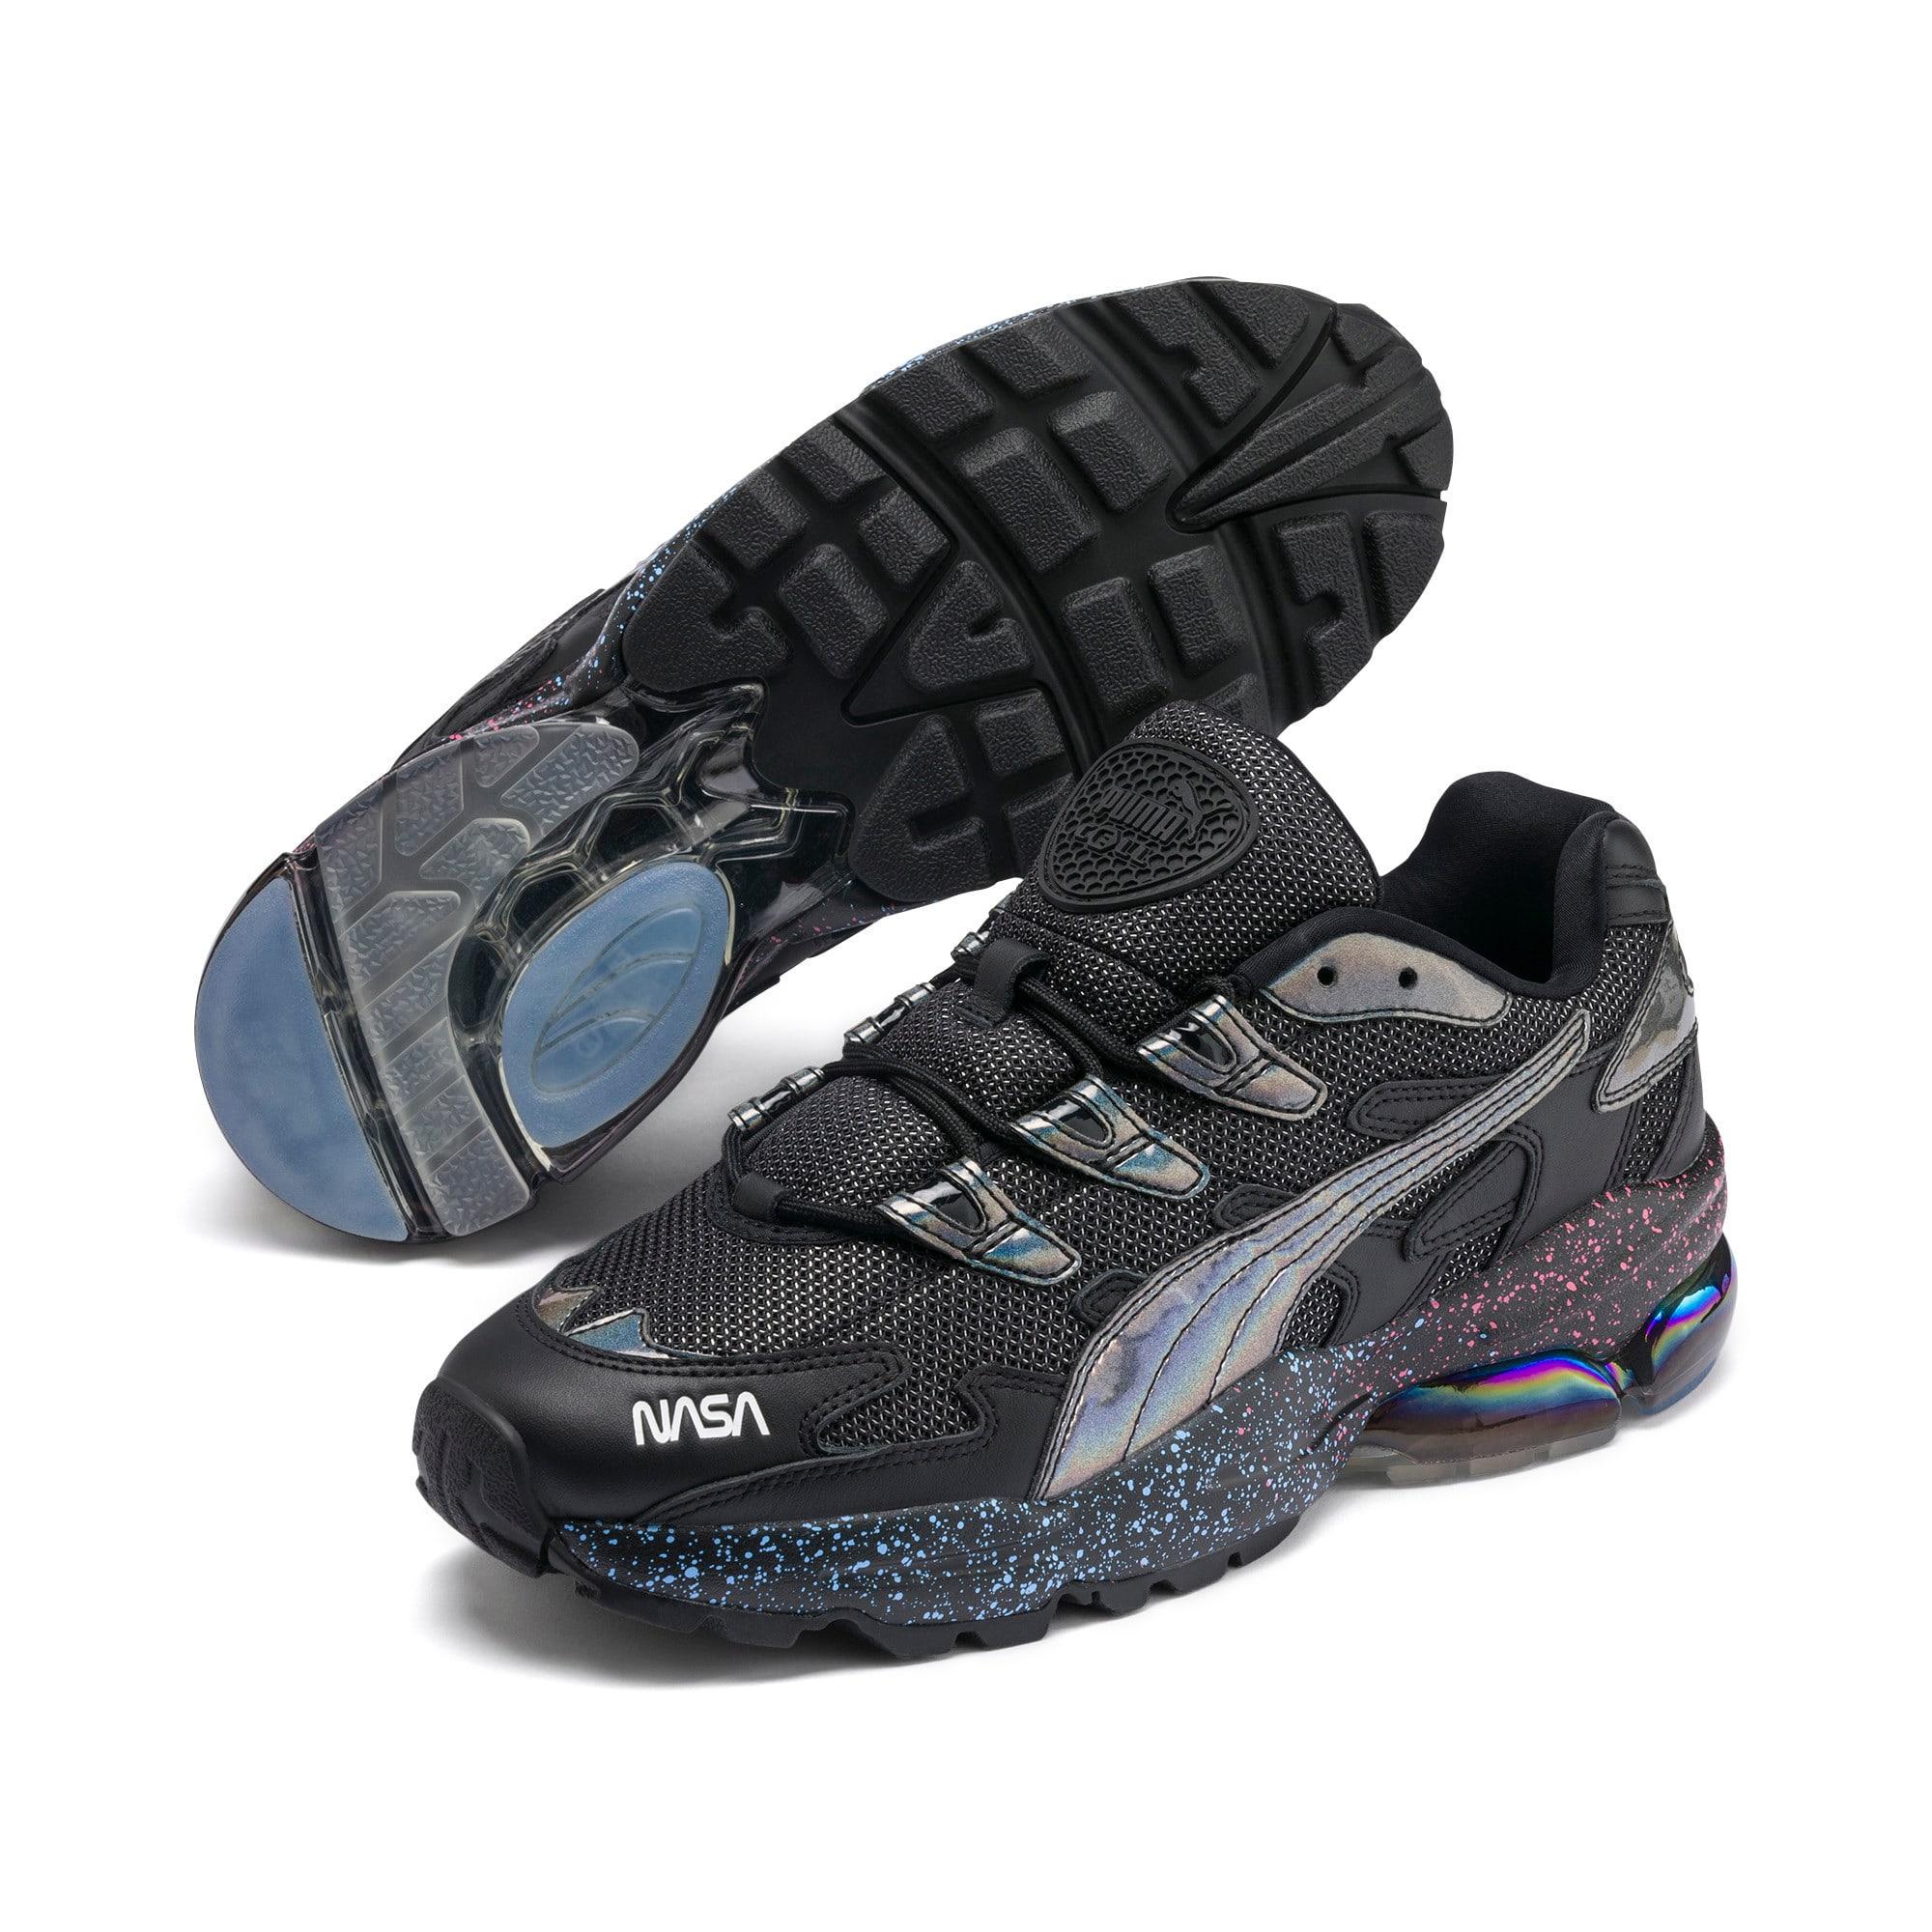 Thumbnail 2 of CELL Alien Space Explorer Sneaker, Puma Black-Puma Black, medium